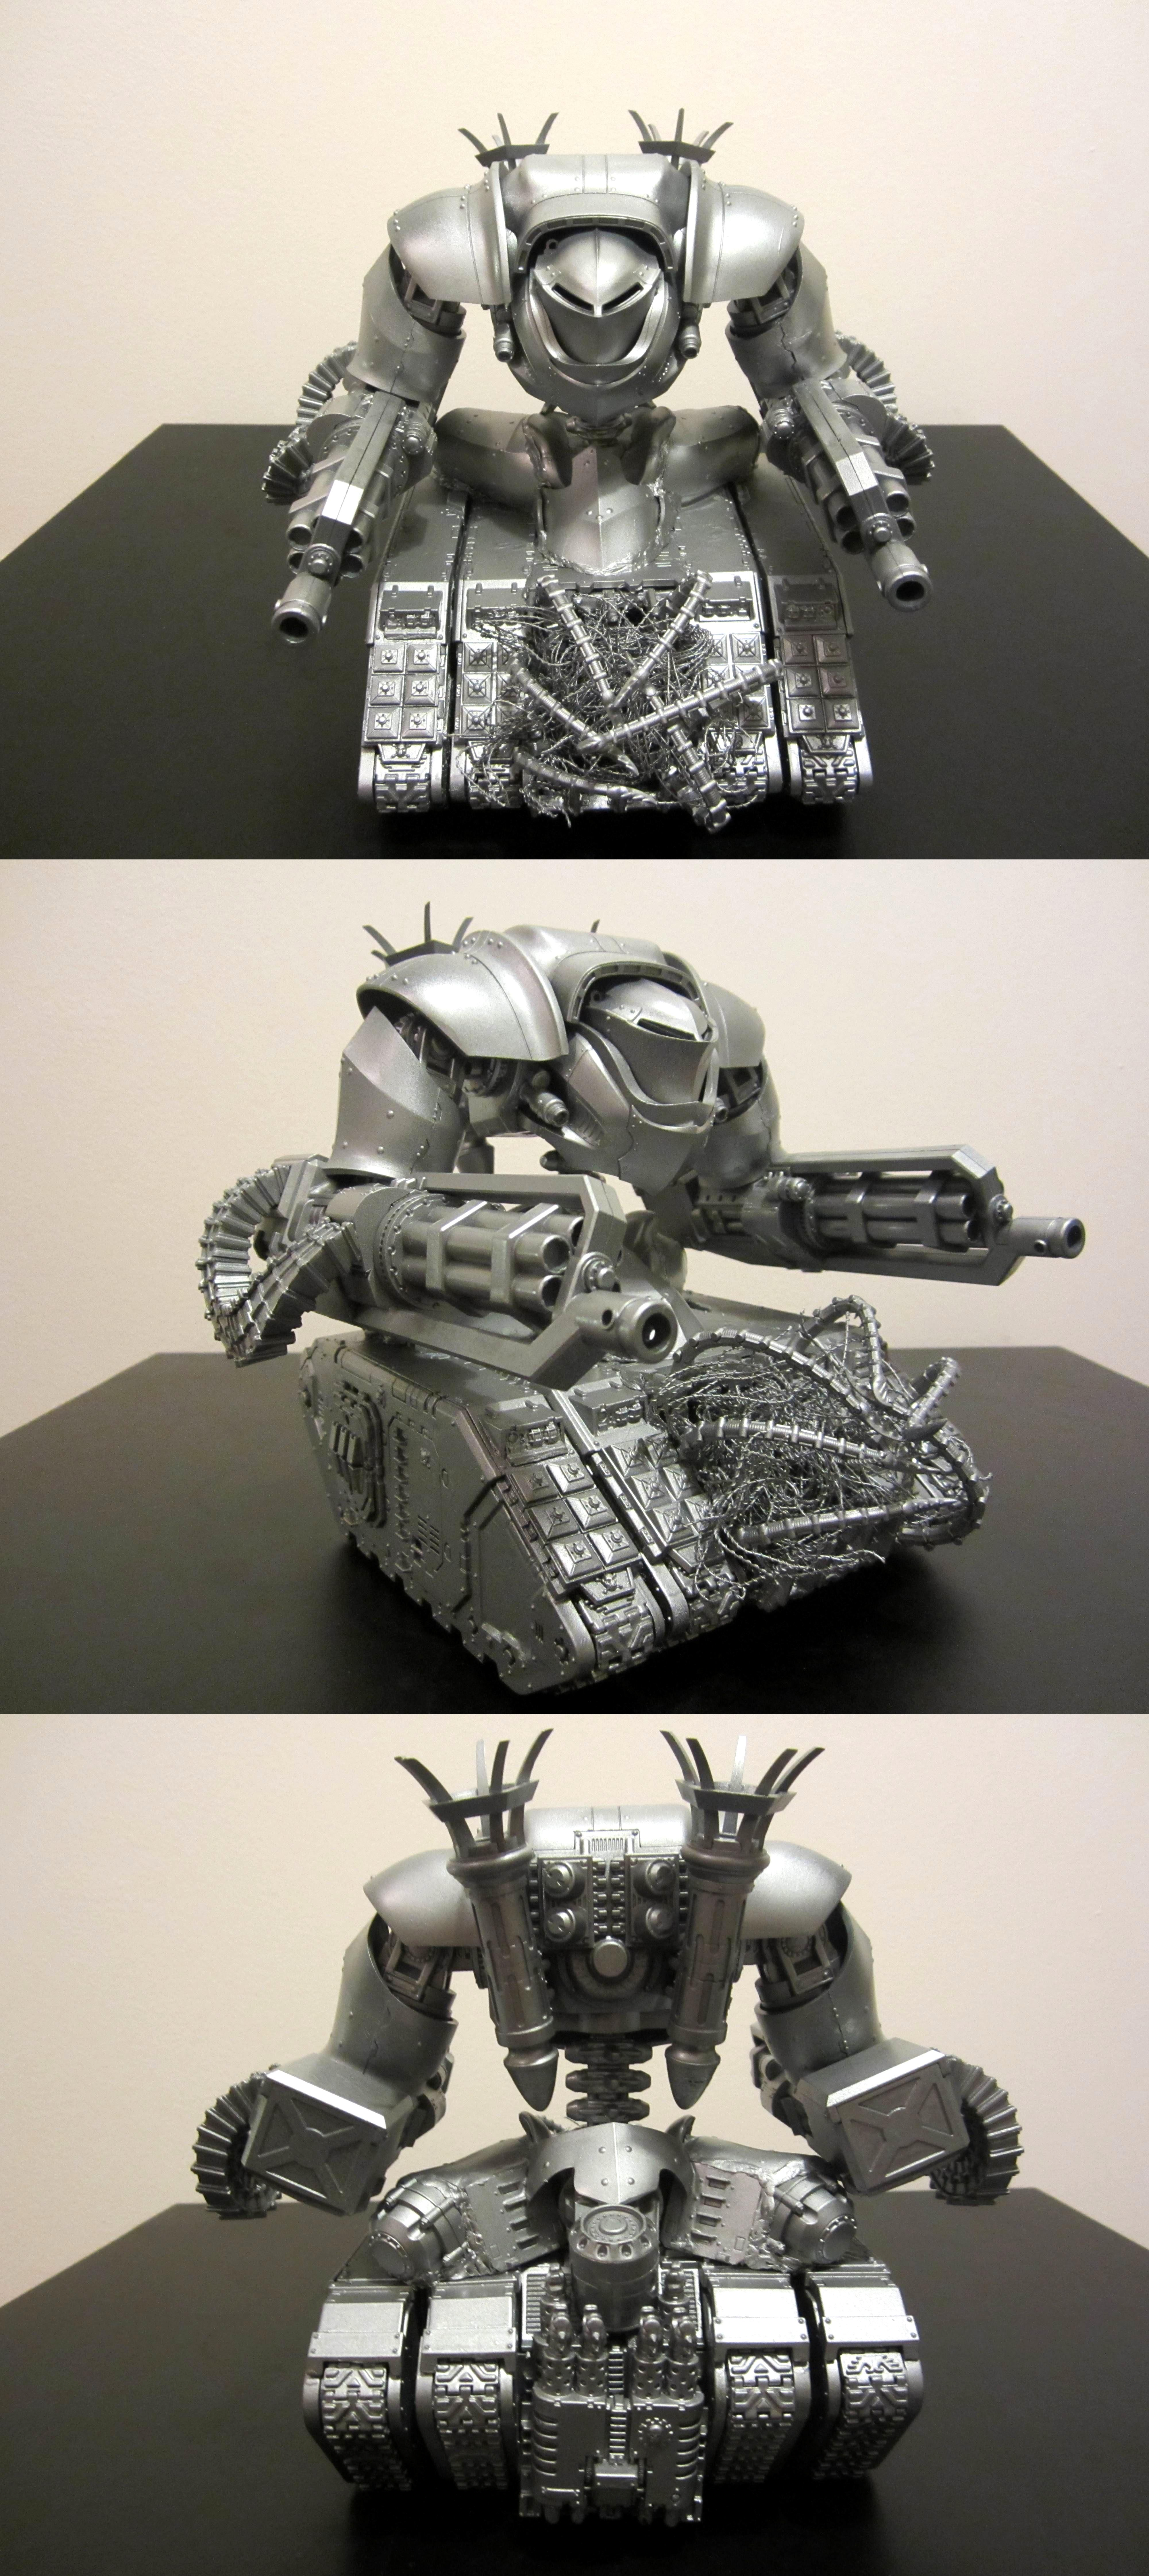 Chaos, Chaos Space Marines, Daemons, Engine, Heavy, Iron Warriors, Kaban, Land Raider, Super-heavy, Tank, Warhammer 40,000